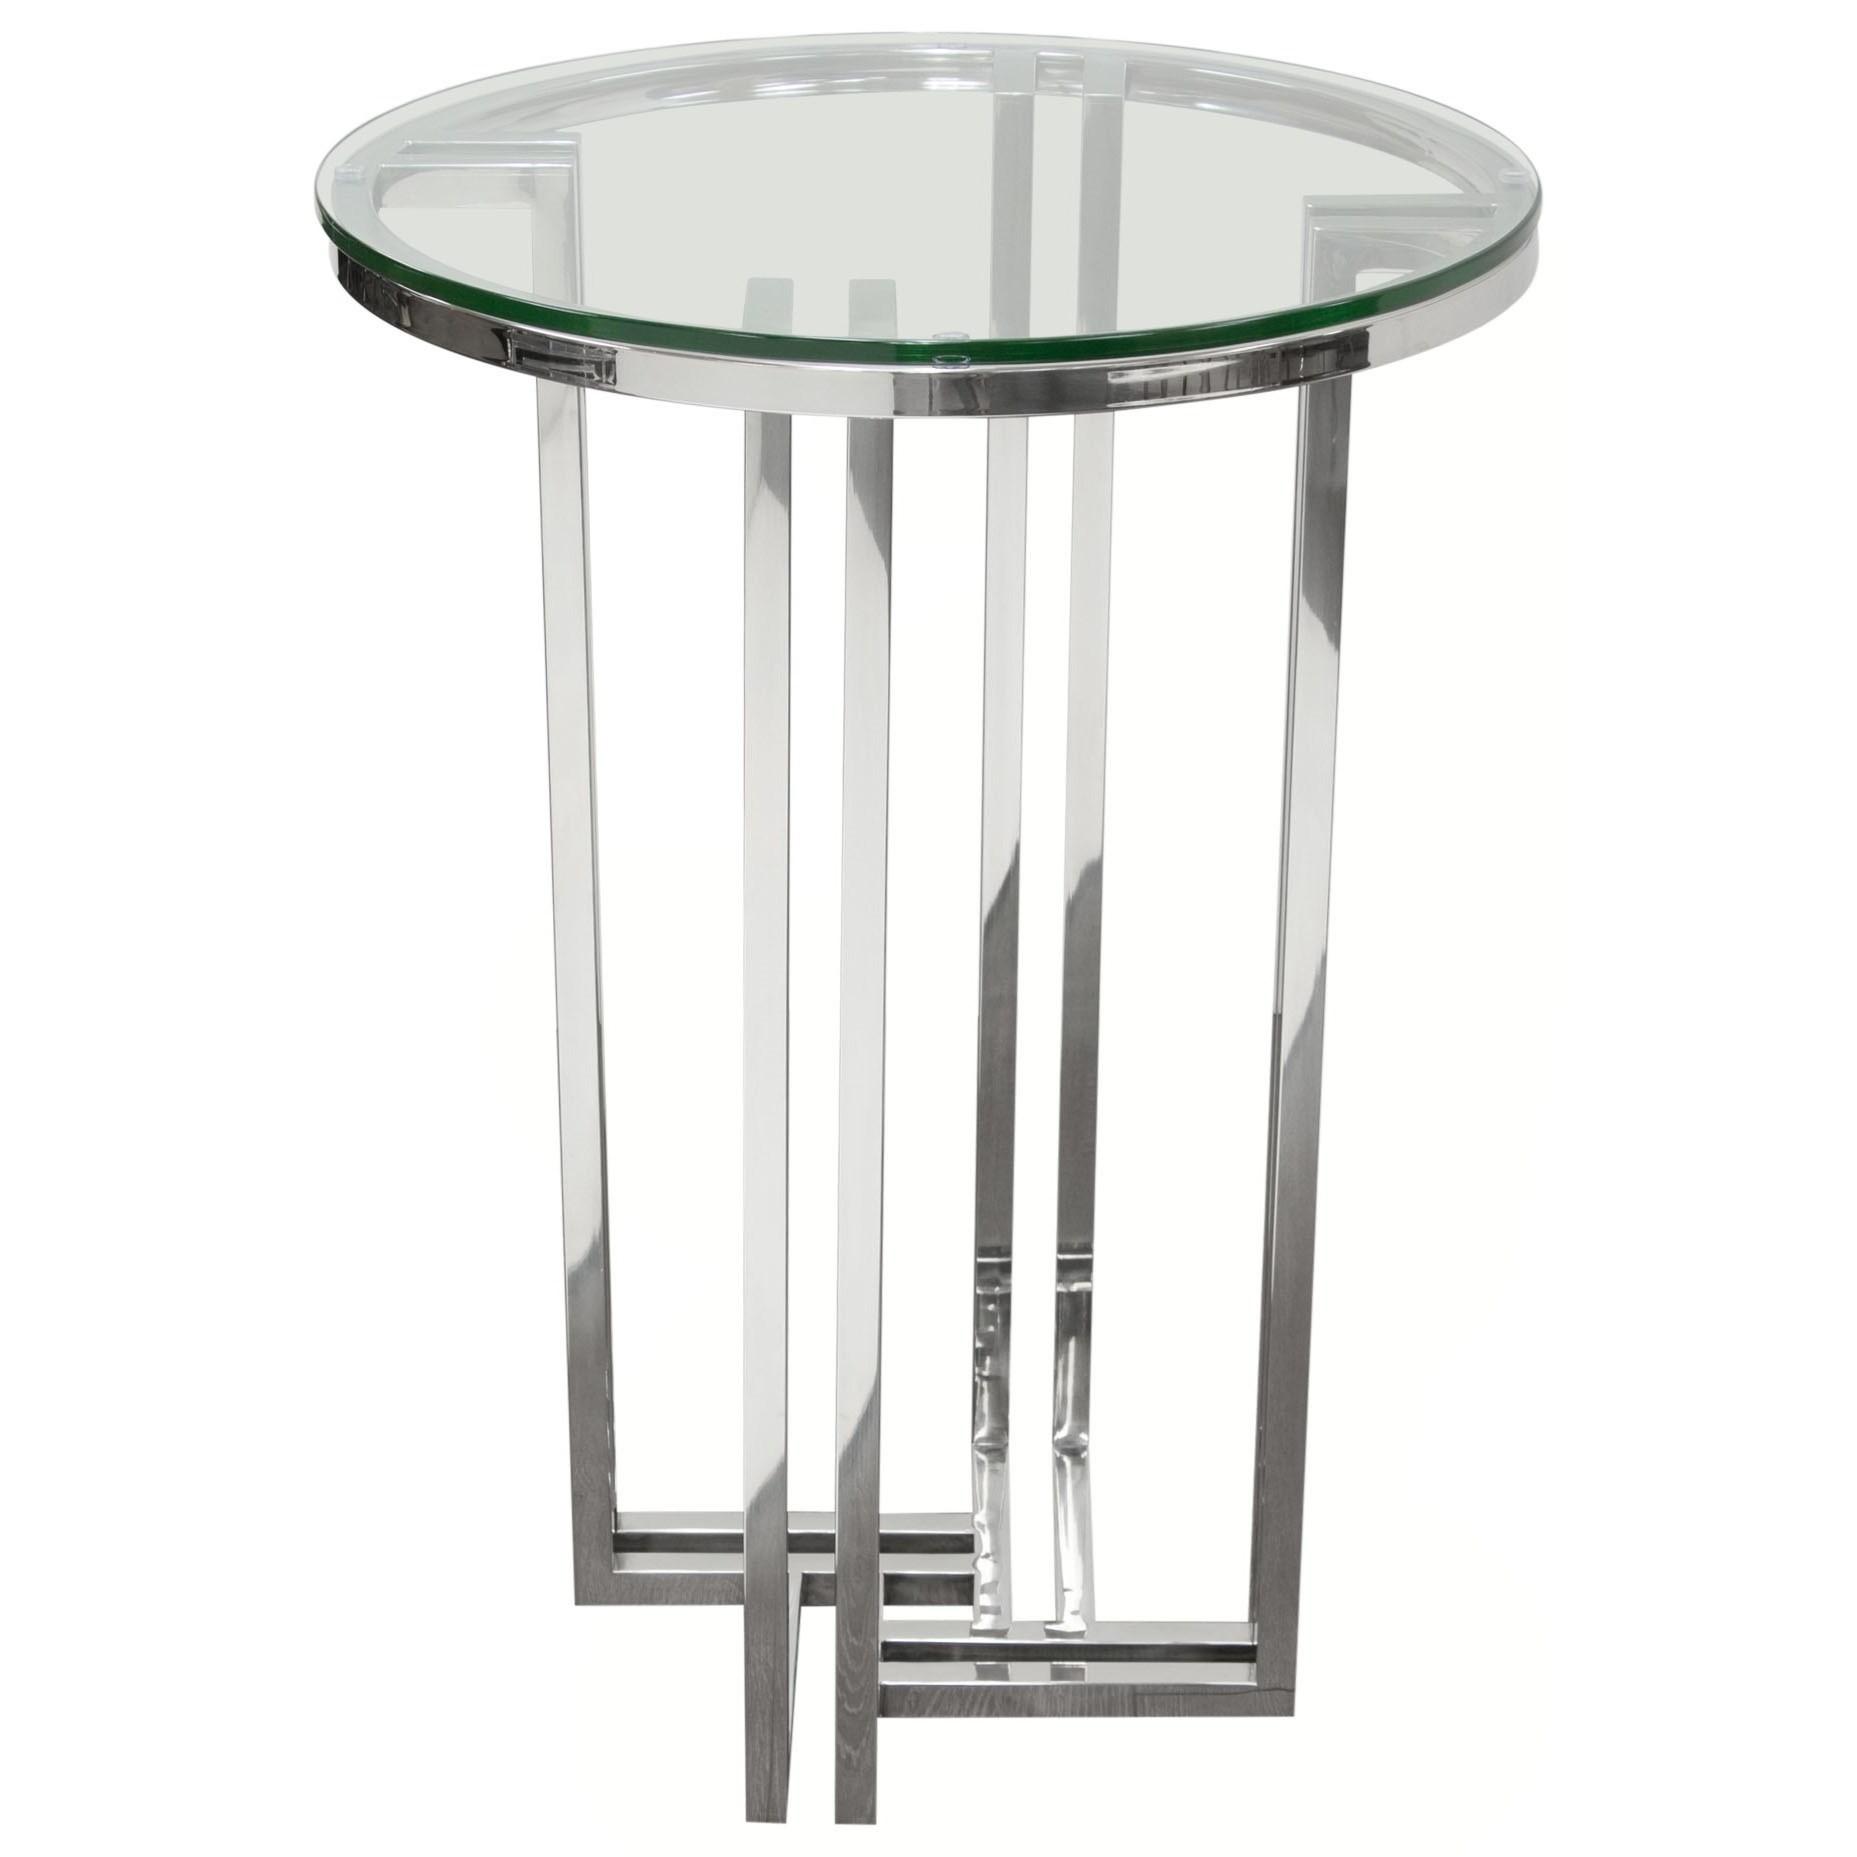 Deko Accent Table by Diamond Sofa at HomeWorld Furniture